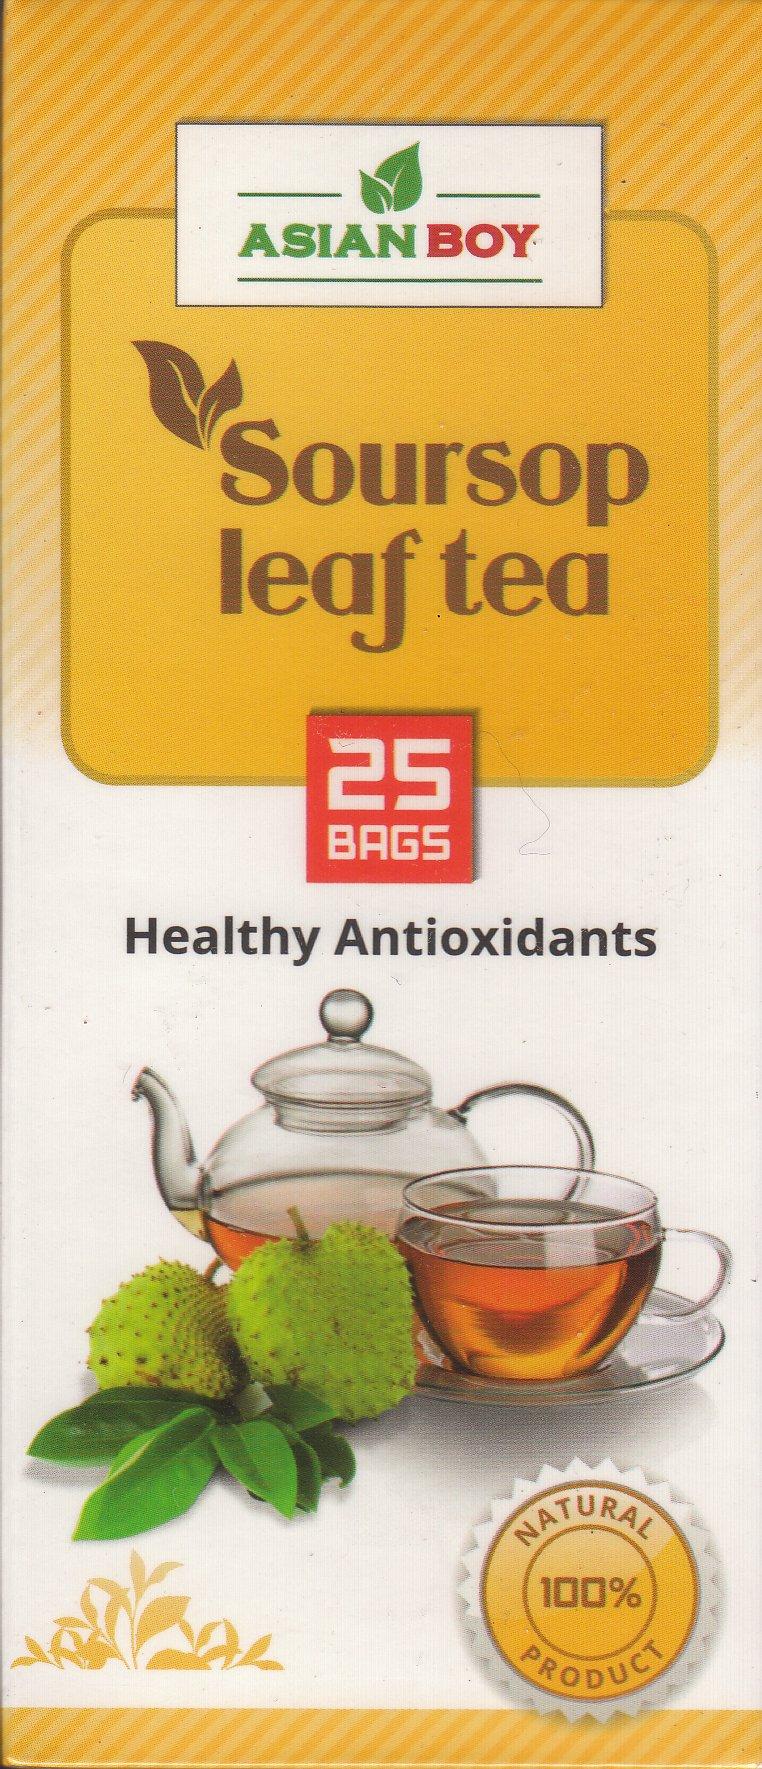 Asian Boy Healthy Antioxidants Tea - 25 Bags (Soursop Leaf)